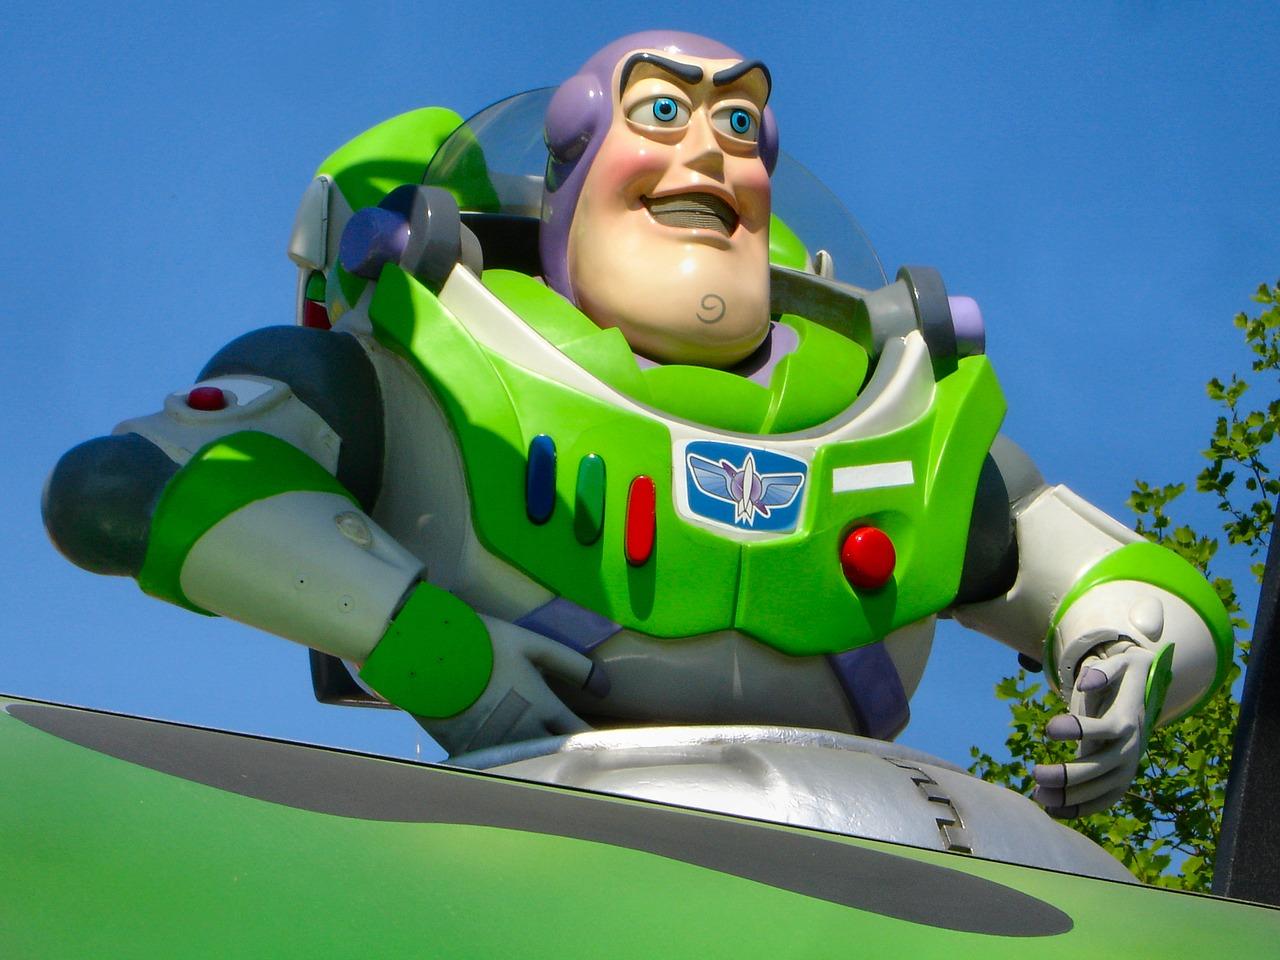 Disney Characters Buzz Lightyear